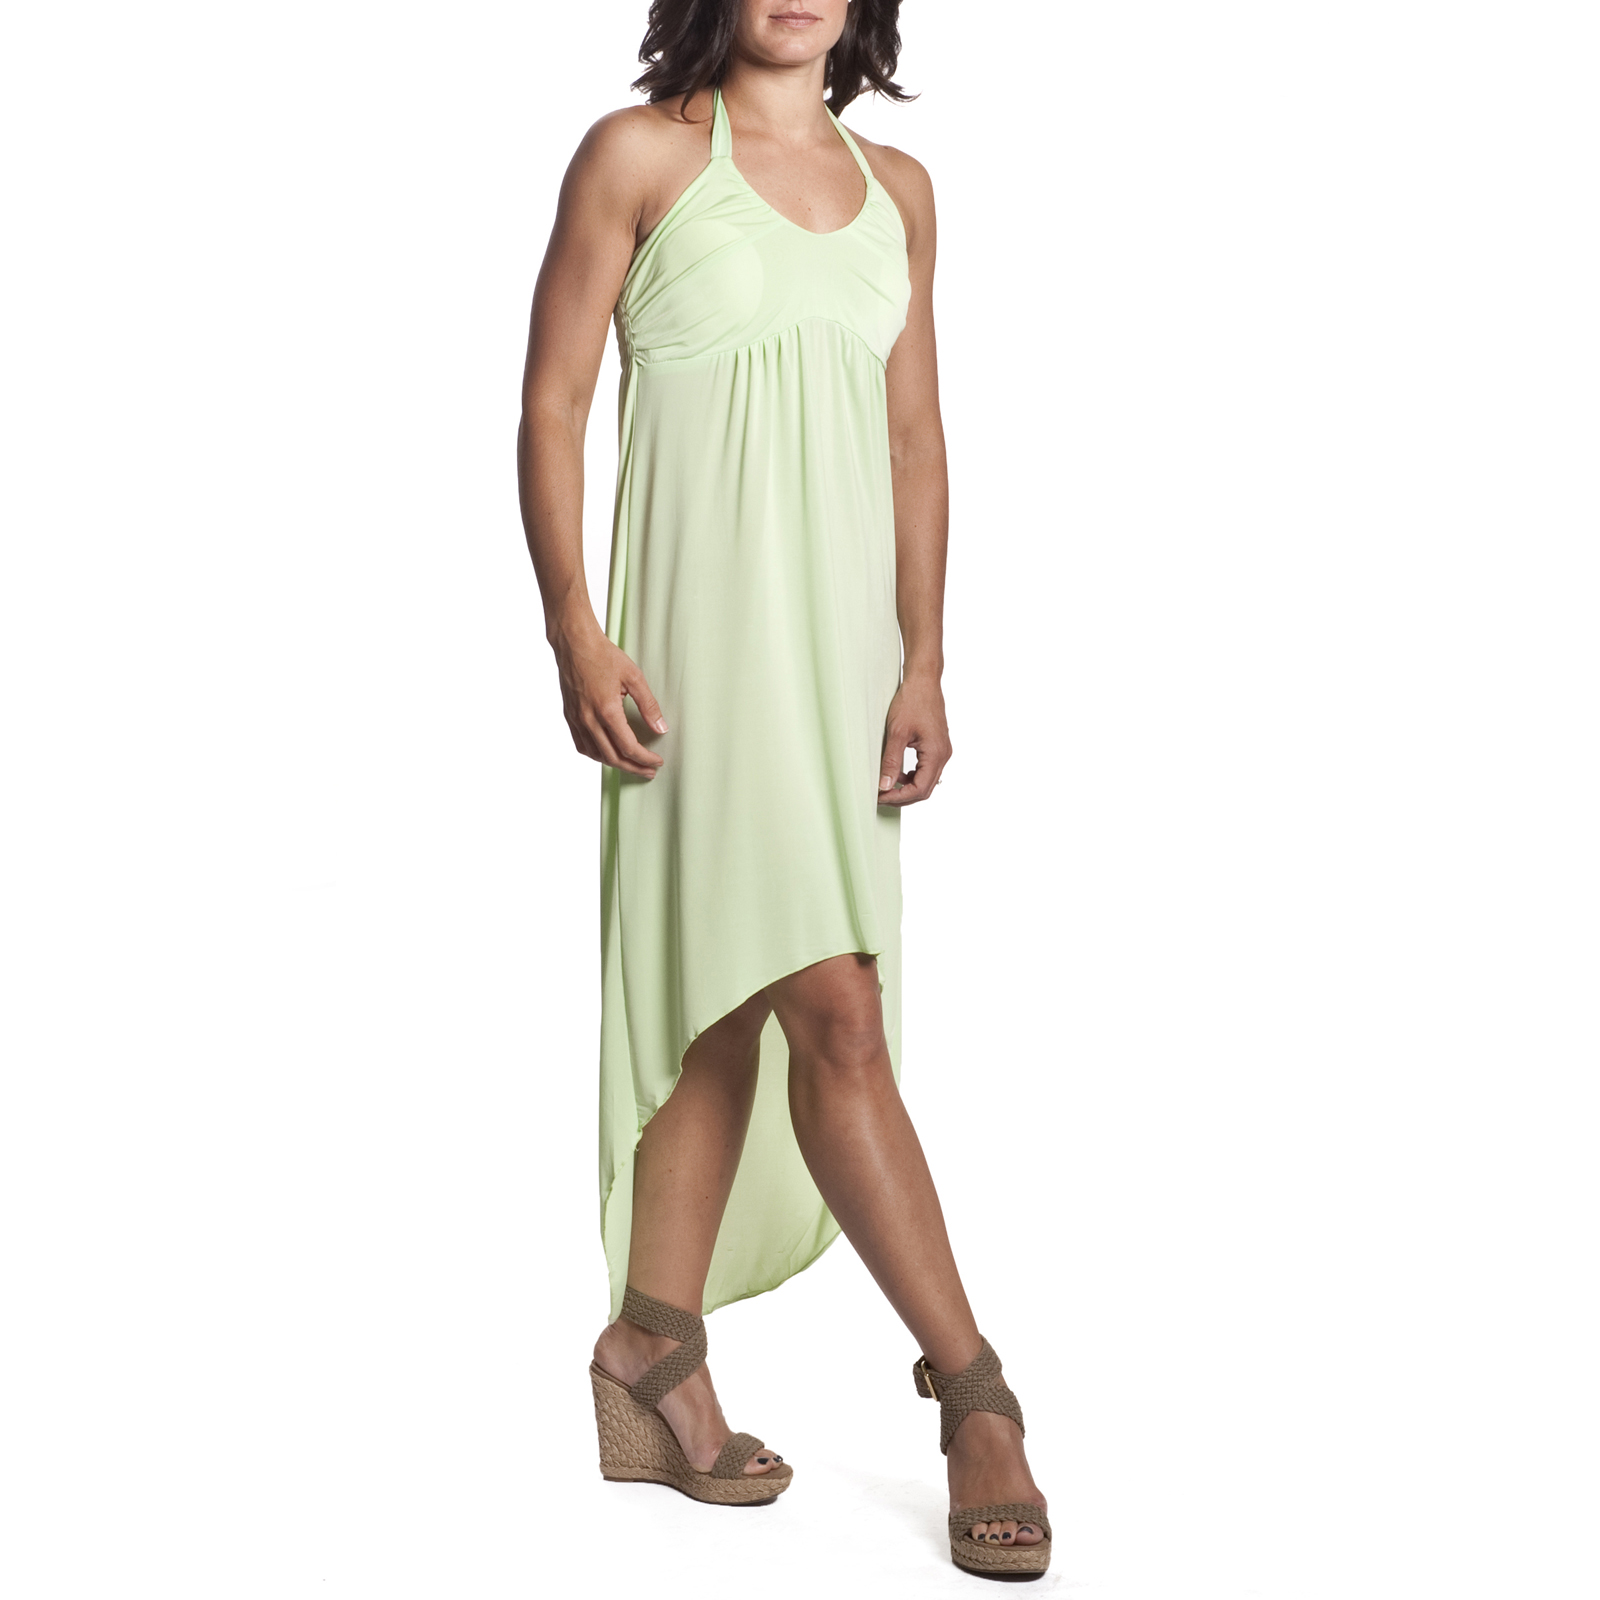 aeb4d19151d6c 3pk Women's Tie-Neck Halter Dress High-Low Hi-Lo Maxi Sundress Beach ...